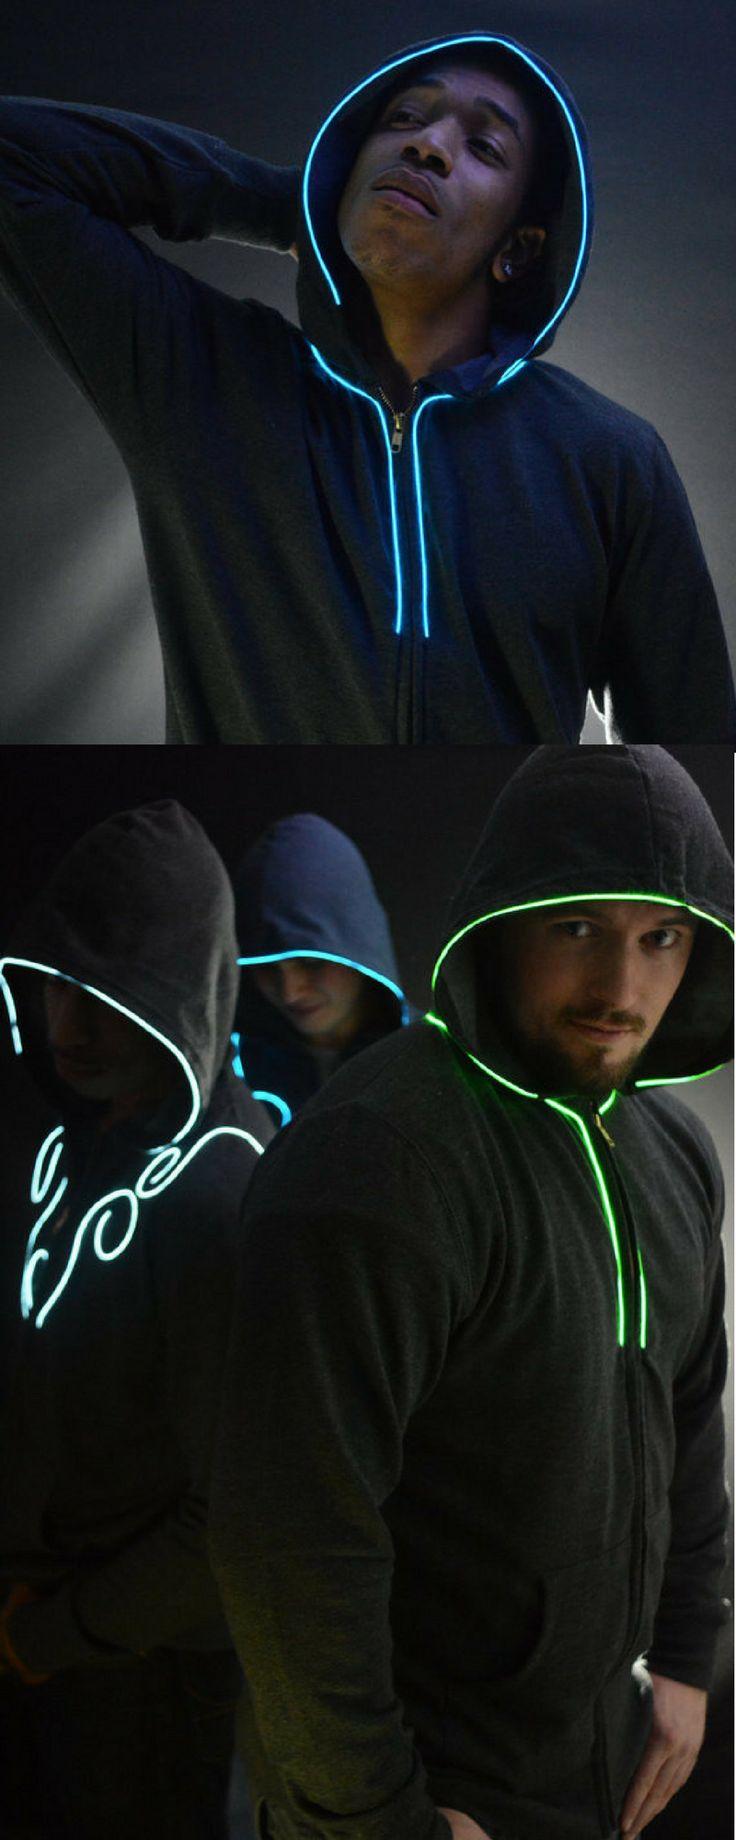 Light up hoodie Led Hoodie with EL wire By NEO LUX -Spector- (led hoodie, light up clothing, edm jacket , edm hoodie, Burning Man hoodie ) #affiliatelink #commissionlink #LED #hoodie #menfashion #menstyle #cool